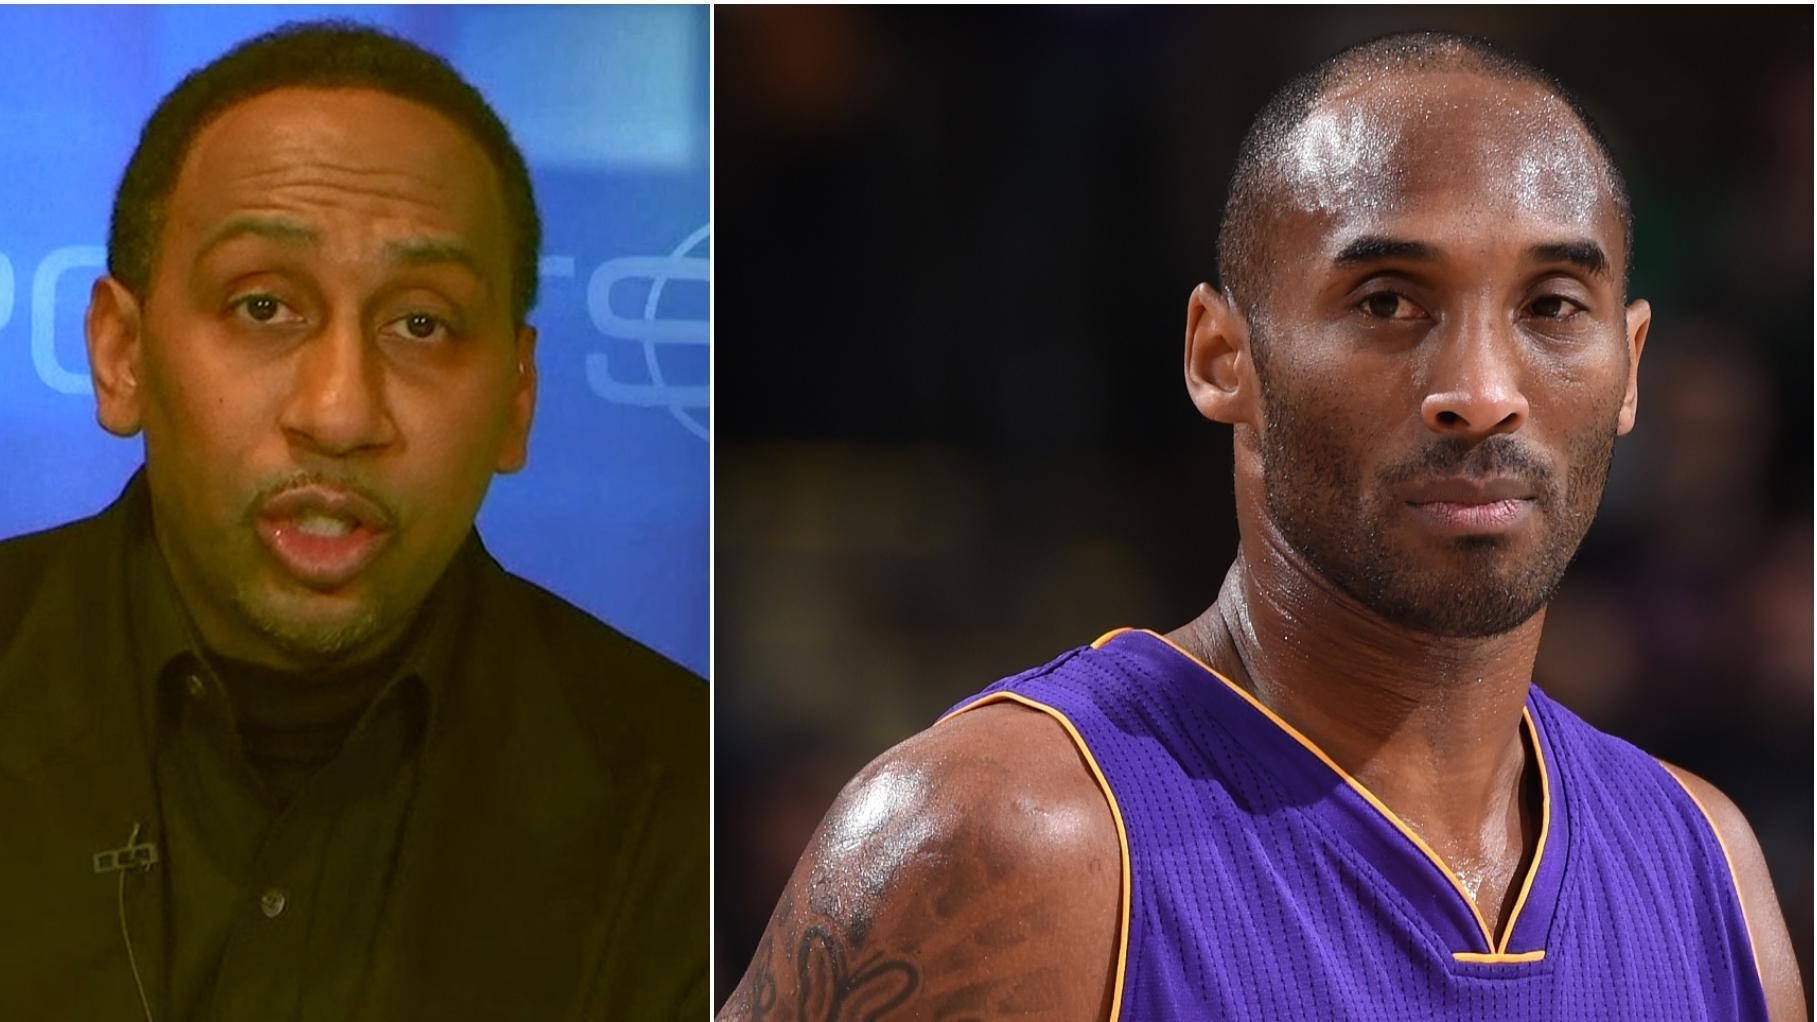 Stephen A.: Kobe had a relentless work ethic